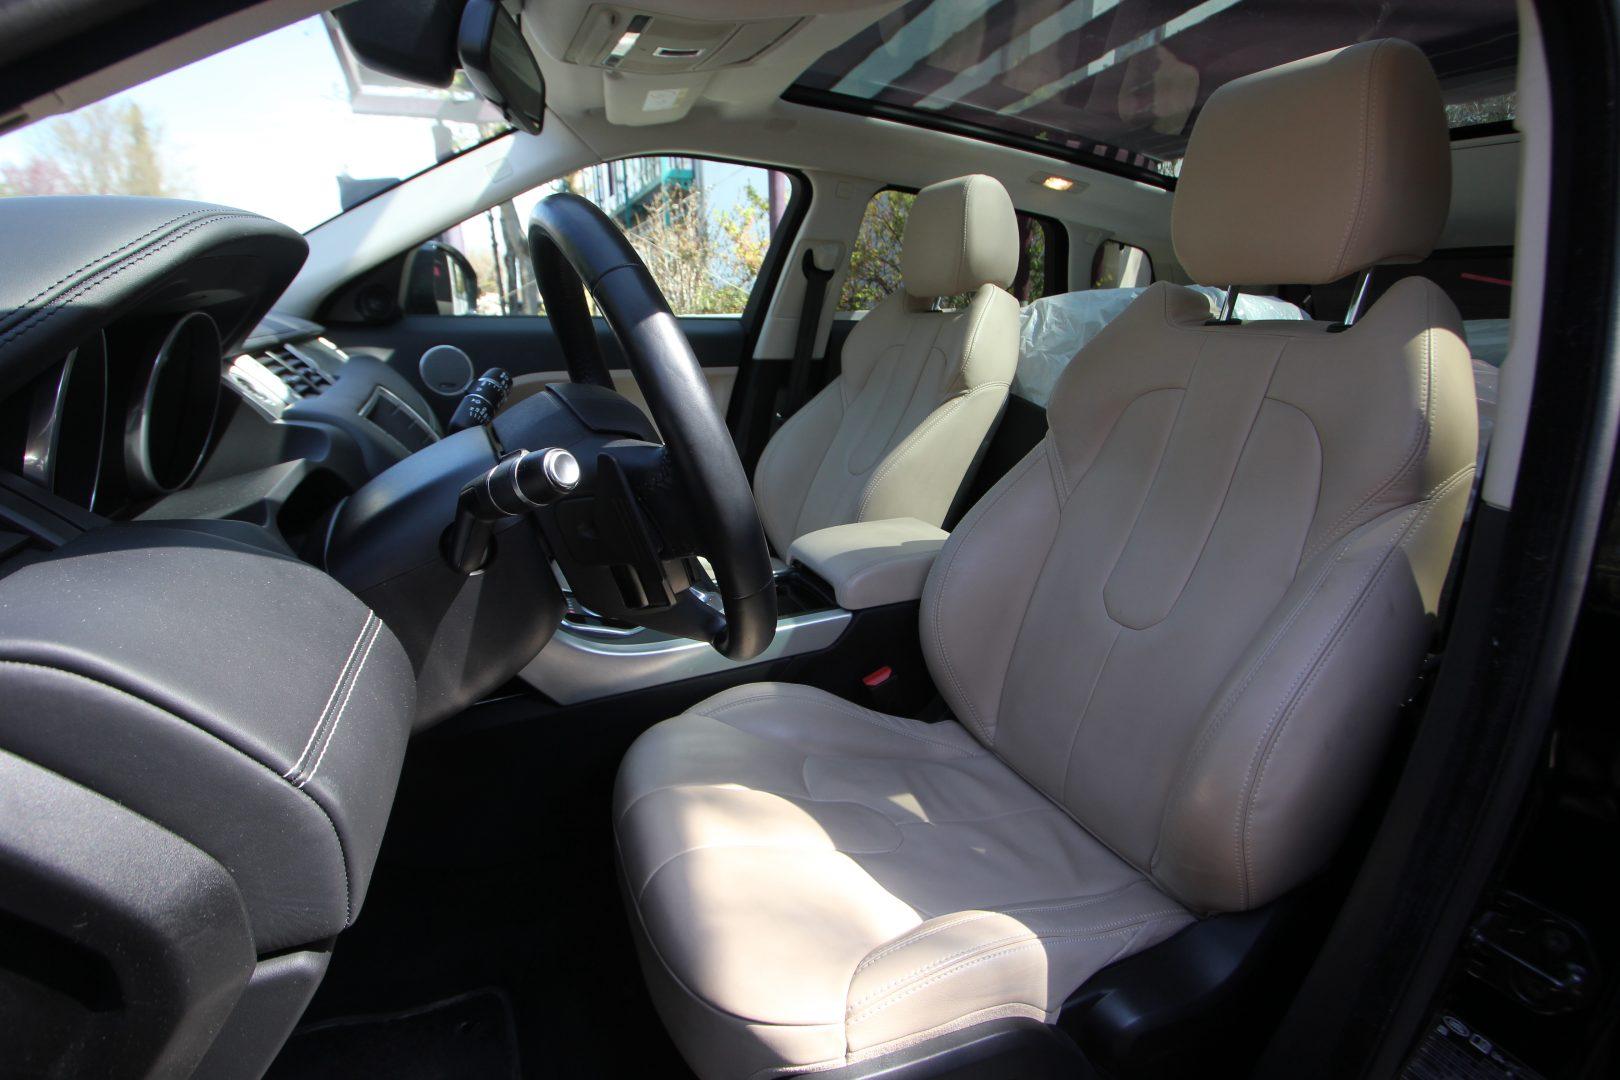 AIL Land Rover Range Rover Evoque Prestige 5